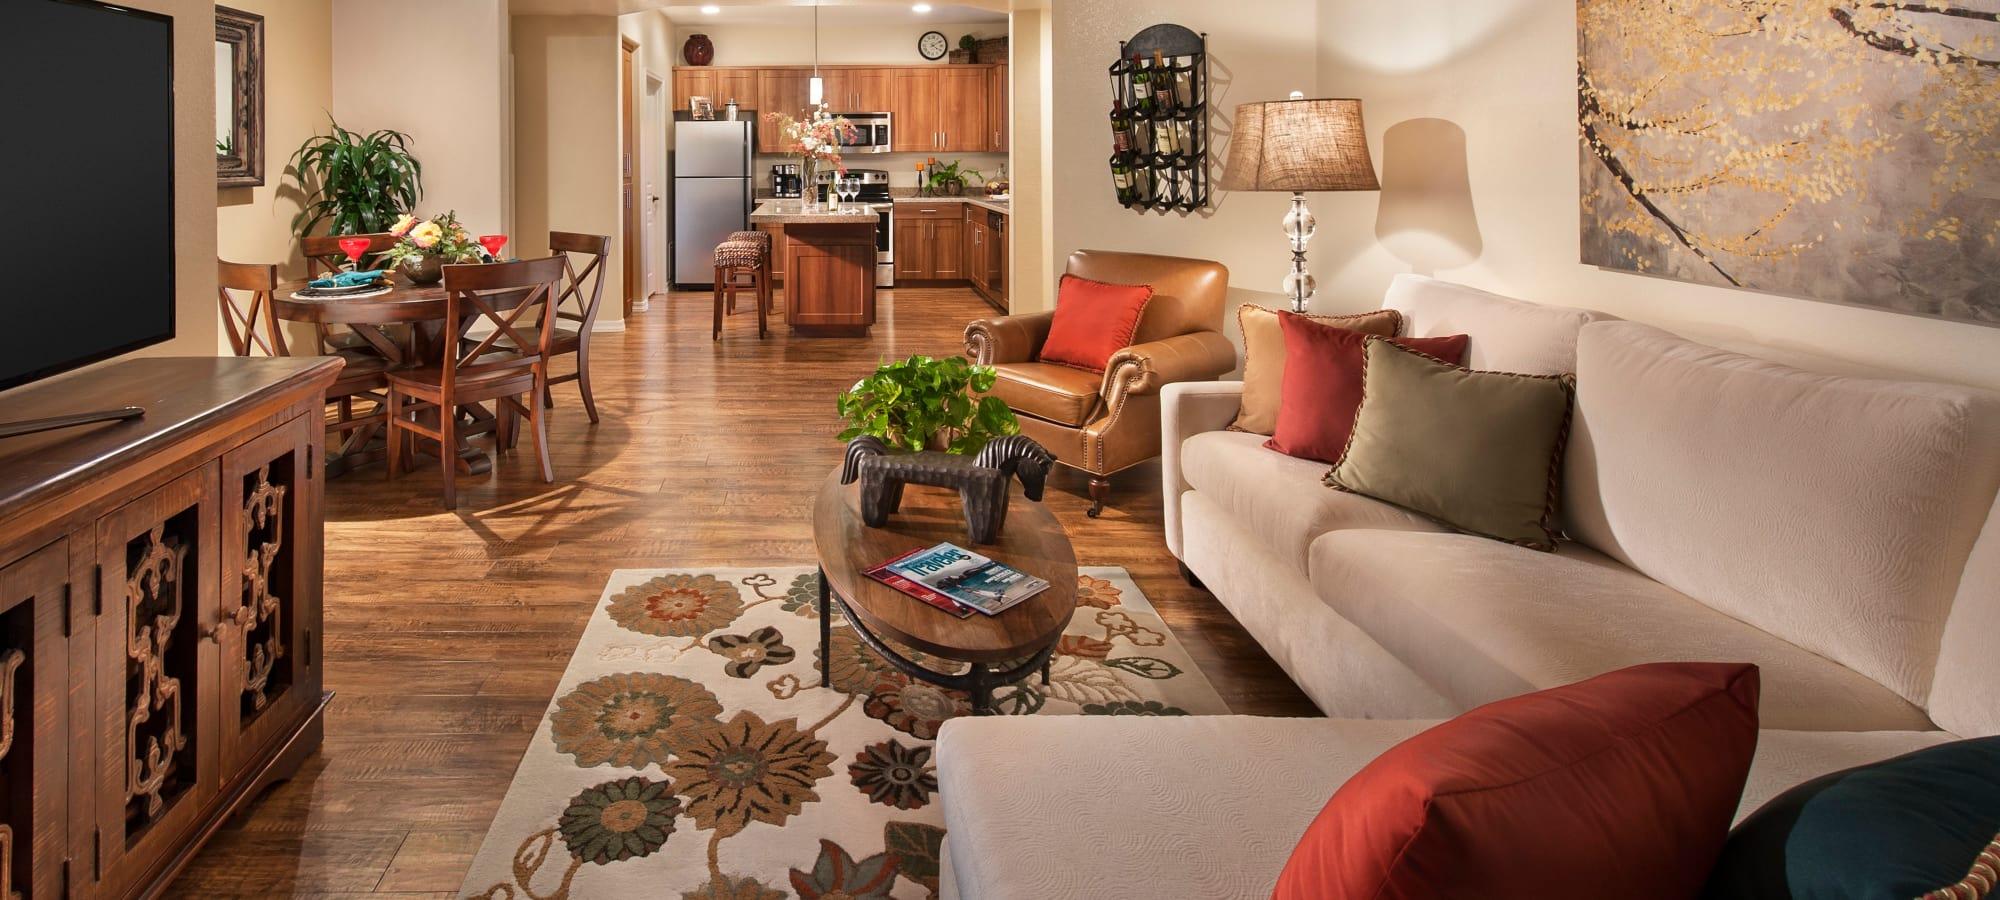 Spacious living room in model home at San Capella in Tempe, Arizona